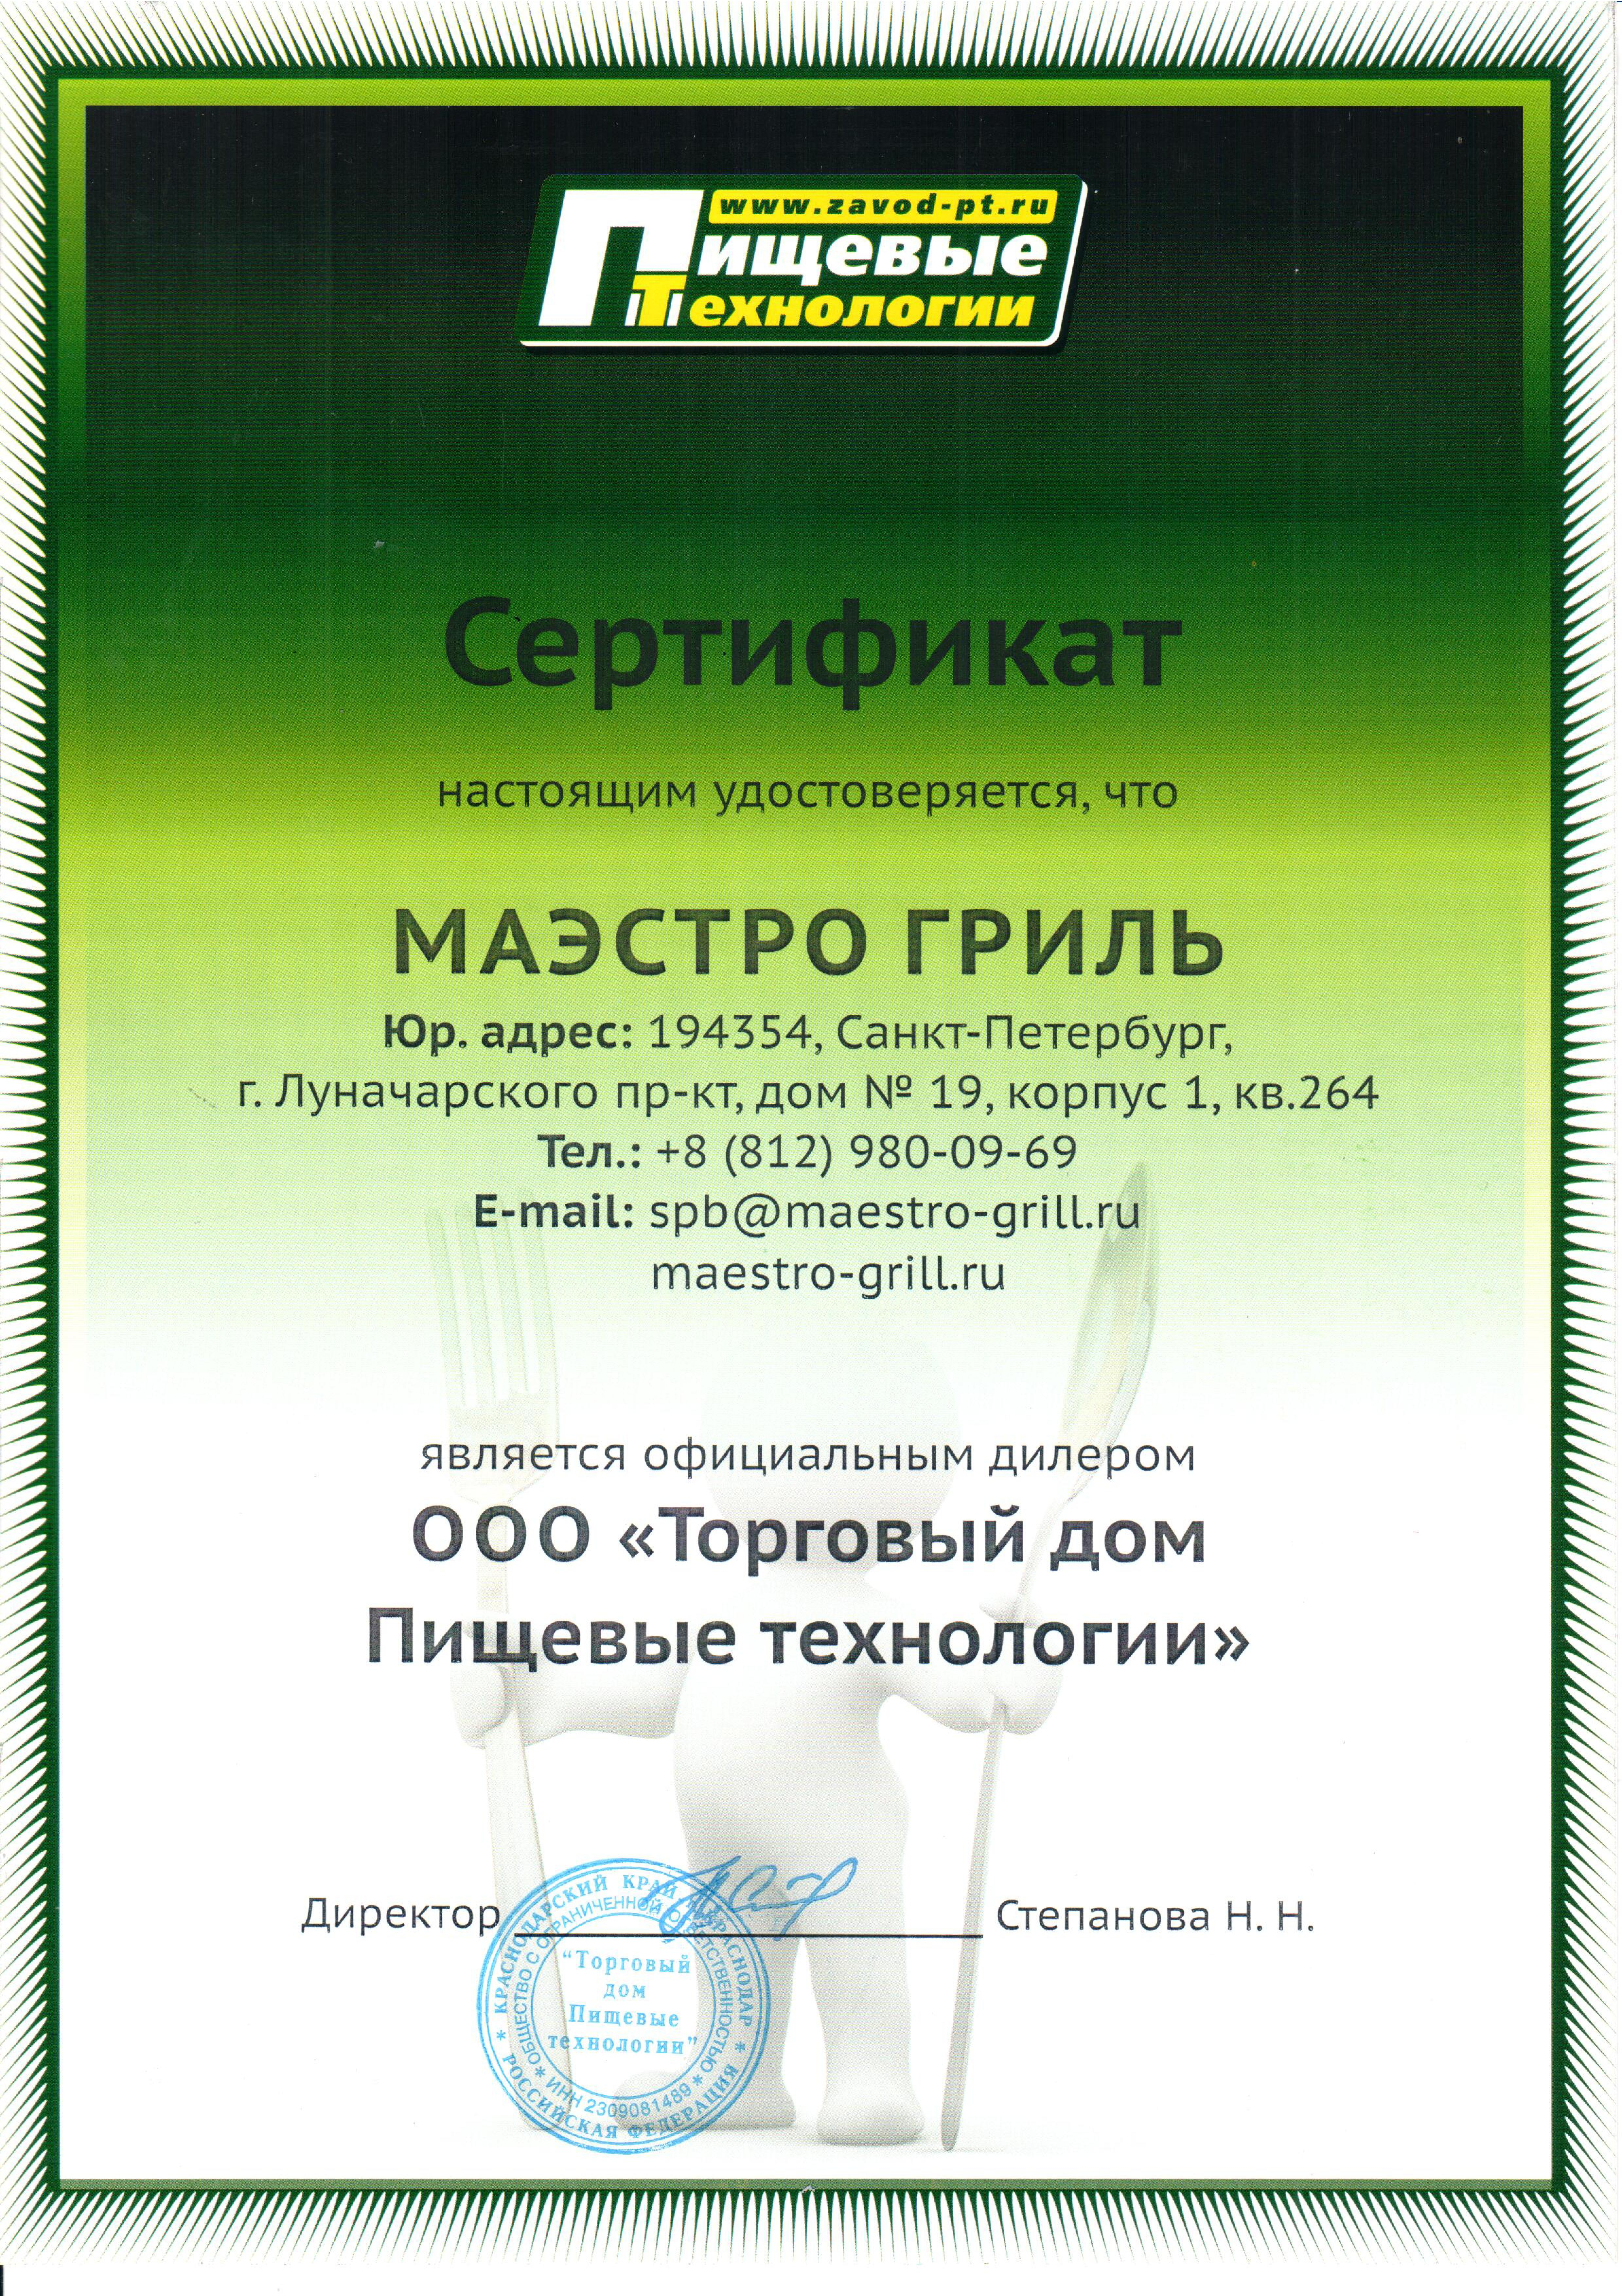 ScanTD0231.jpg